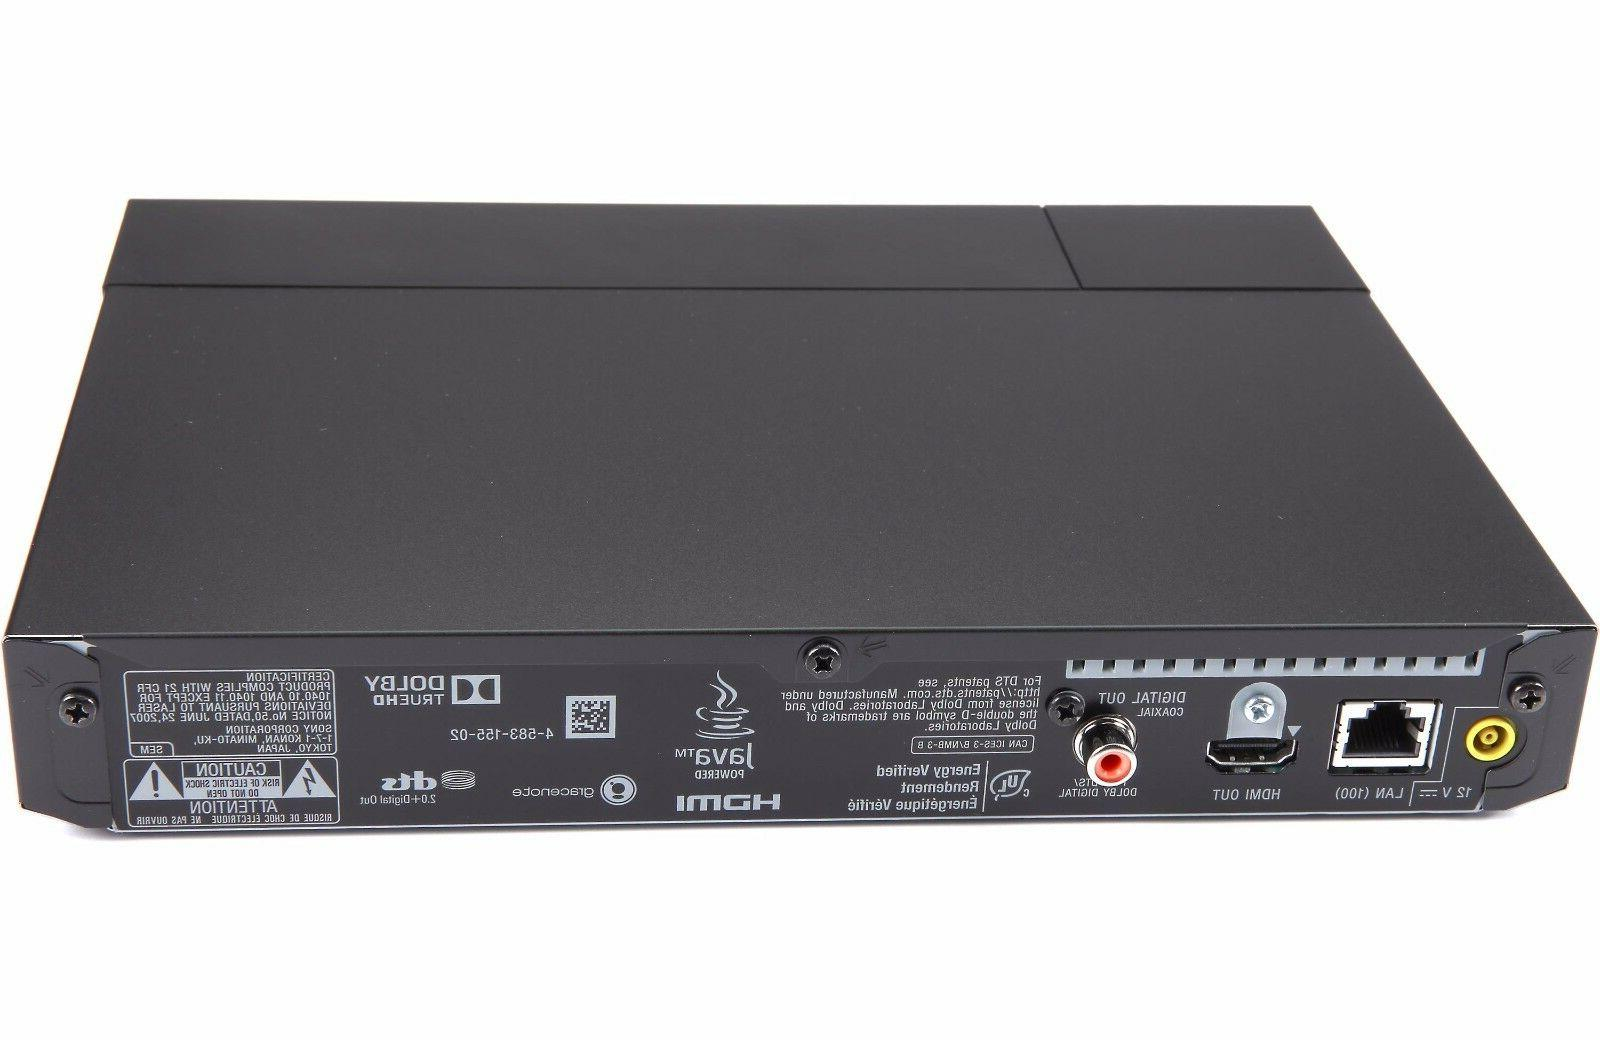 Sony Smart UHD Upscaling Player w/ WiFi Bluetooth